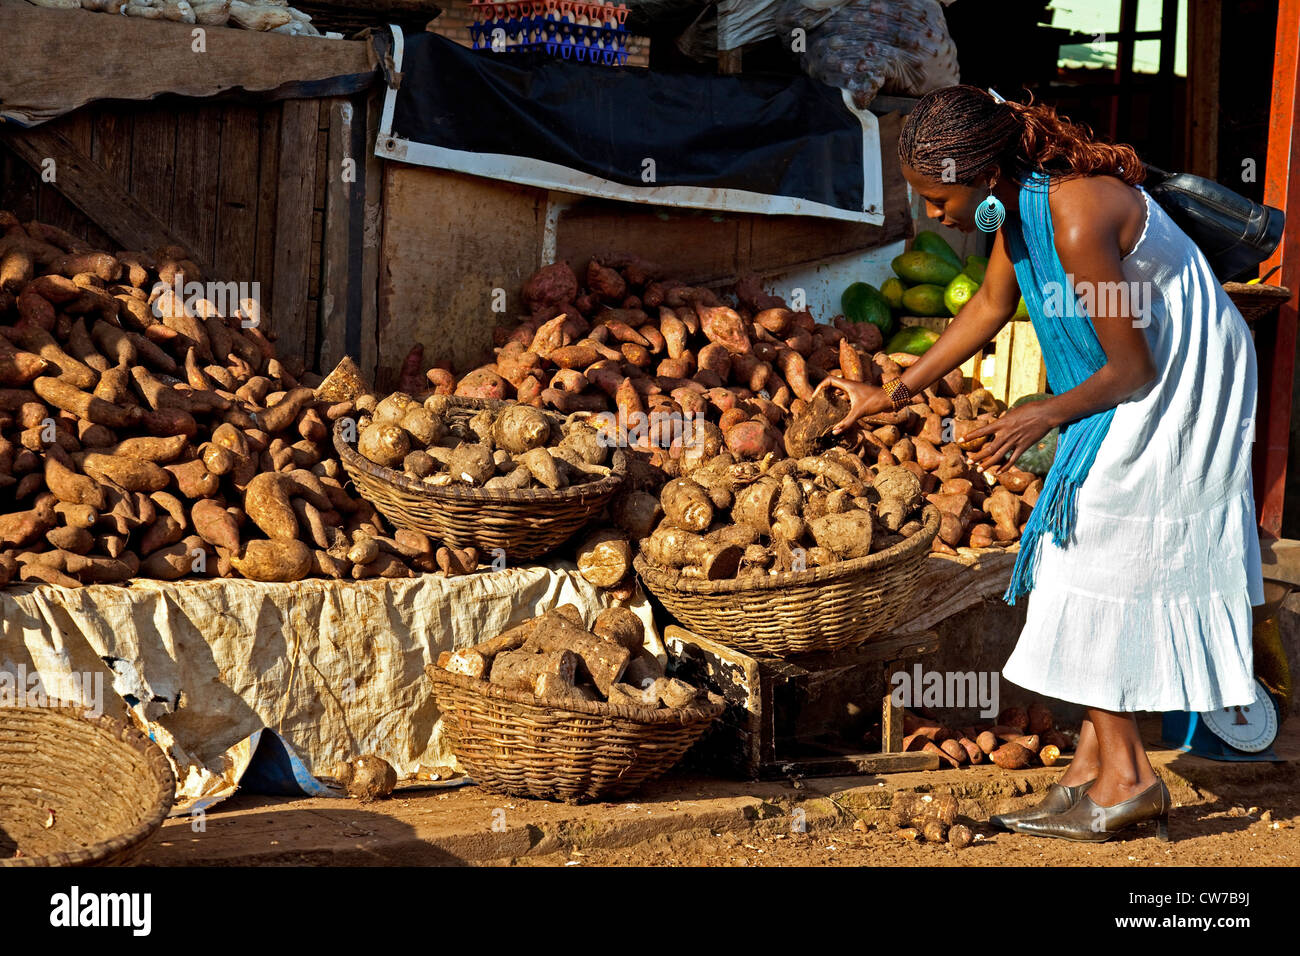 young woman selecting best fruits at market stand with potatoes and yams, Rwanda, Nyamirambo, Kigali - Stock Image